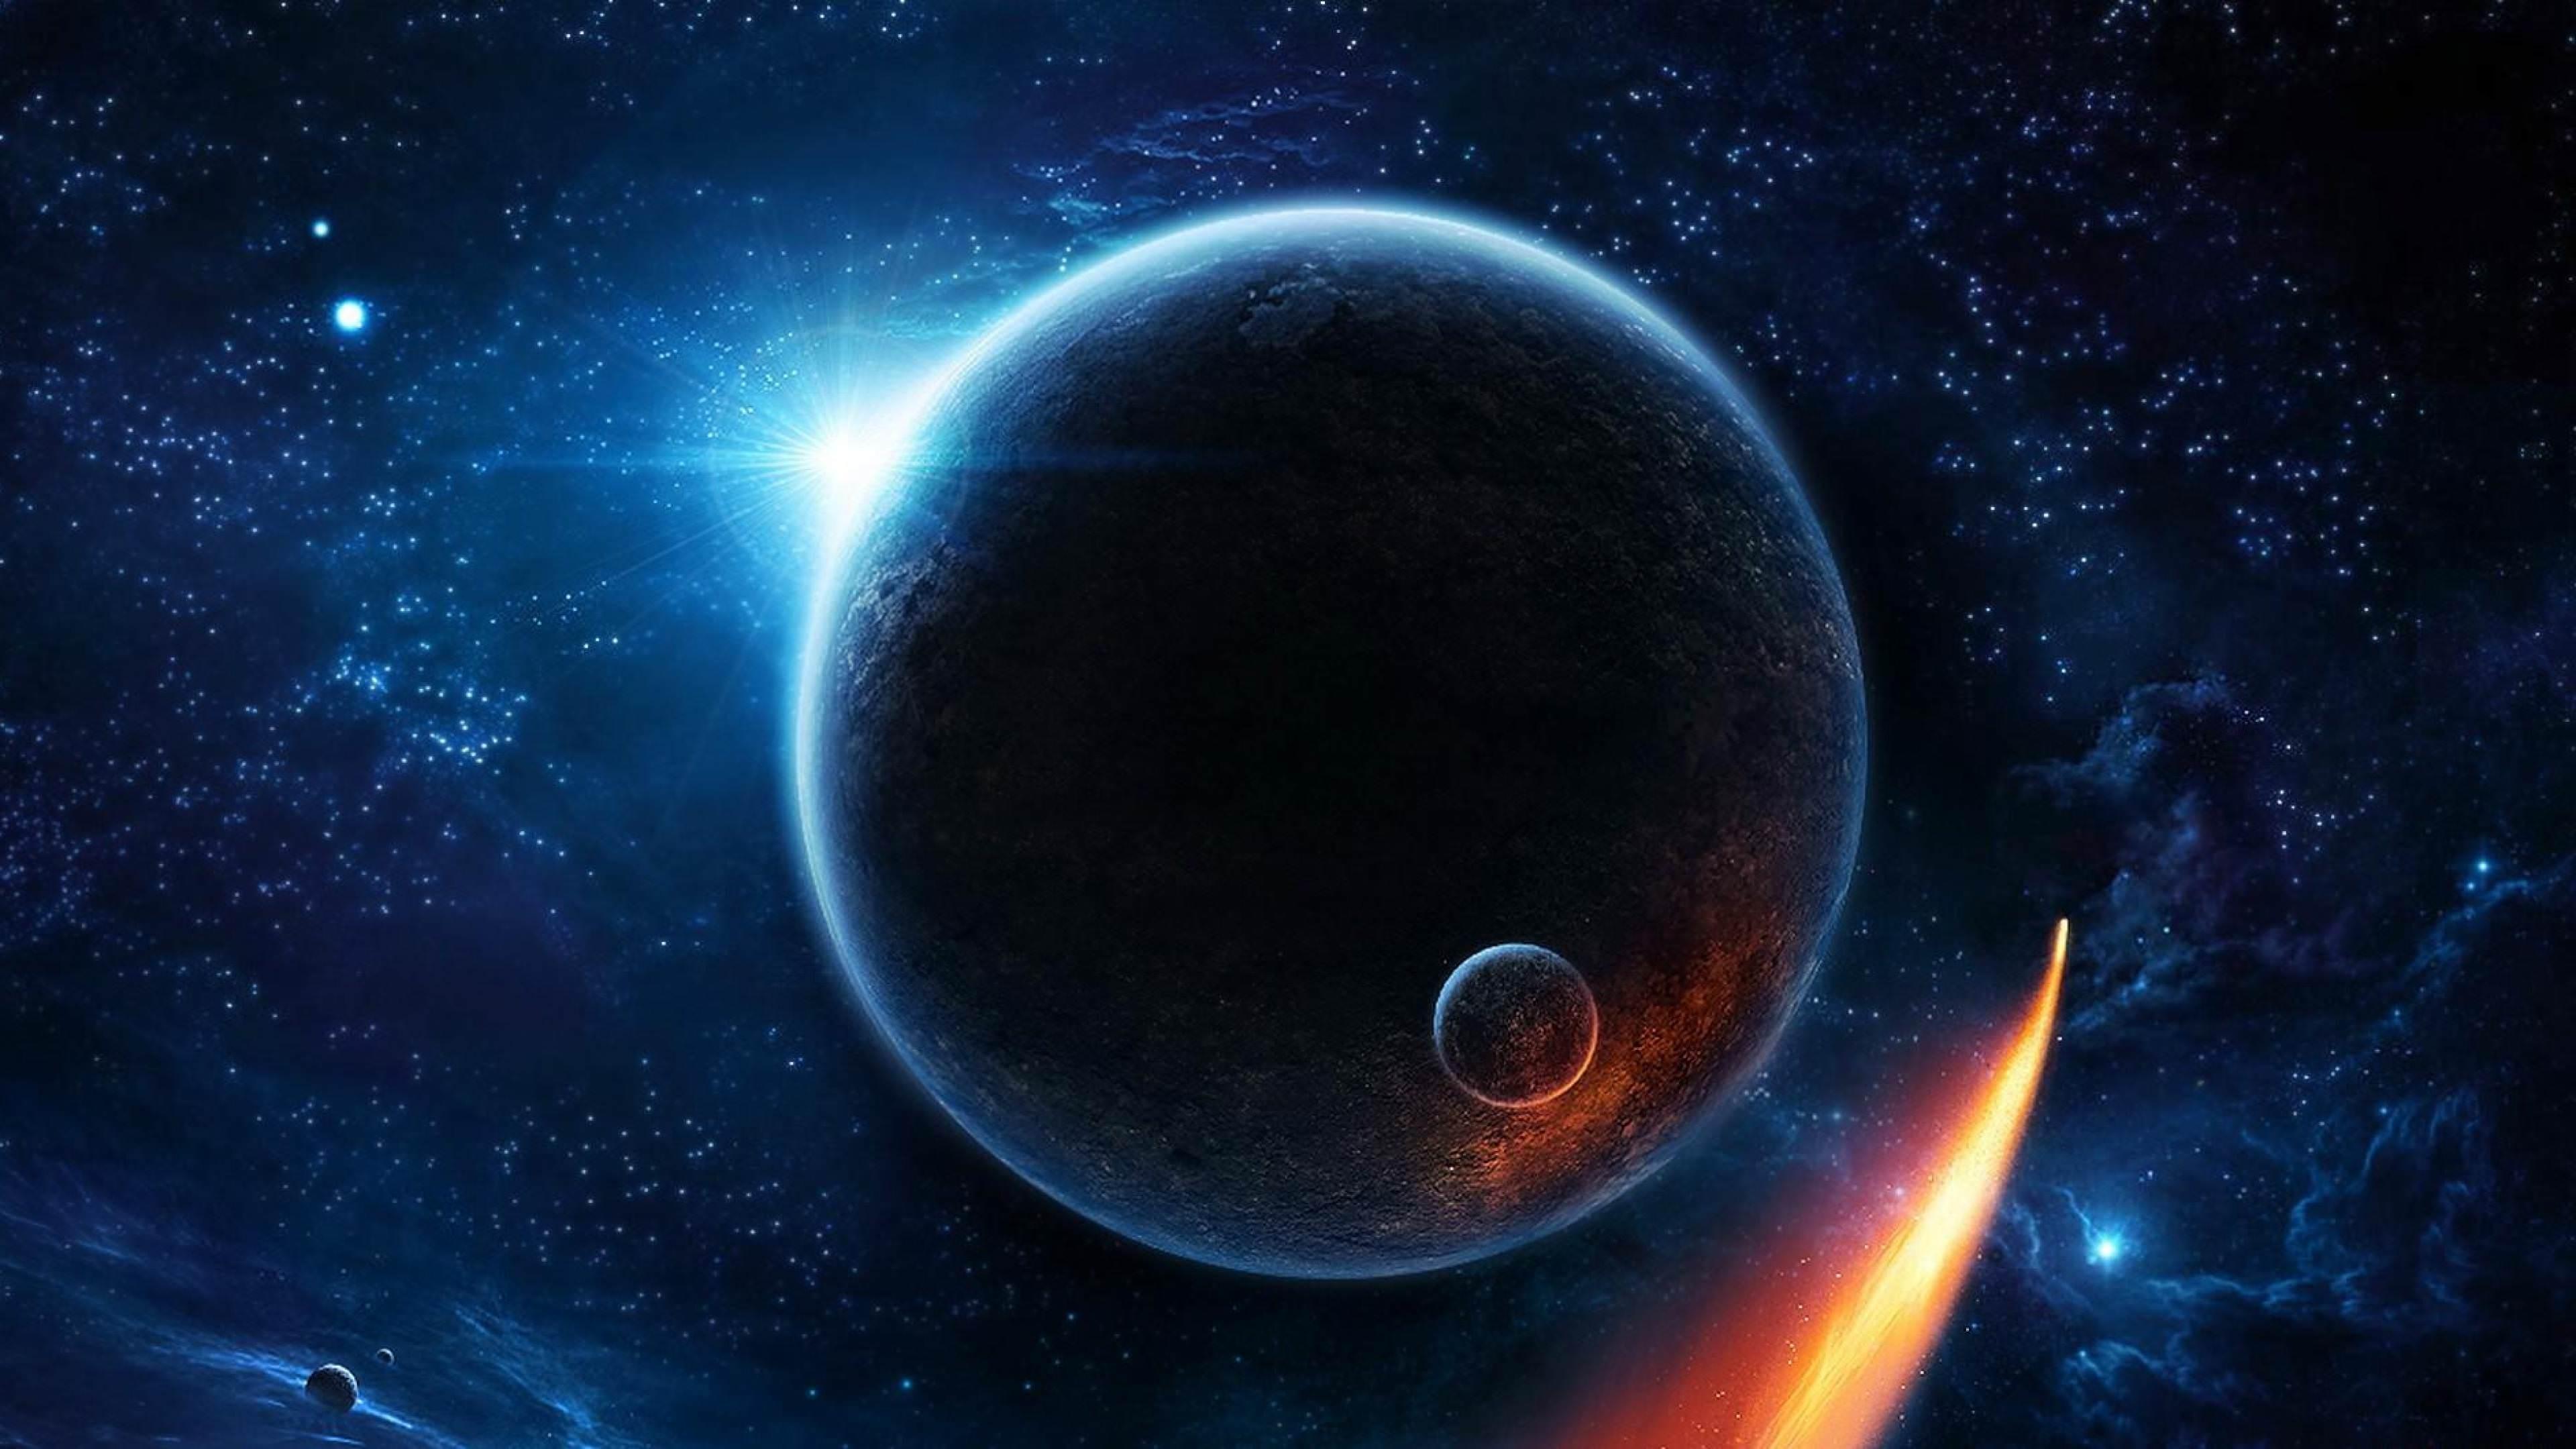 4K Nebula Wallpapers - Top Free 4K Nebula Backgrounds ...